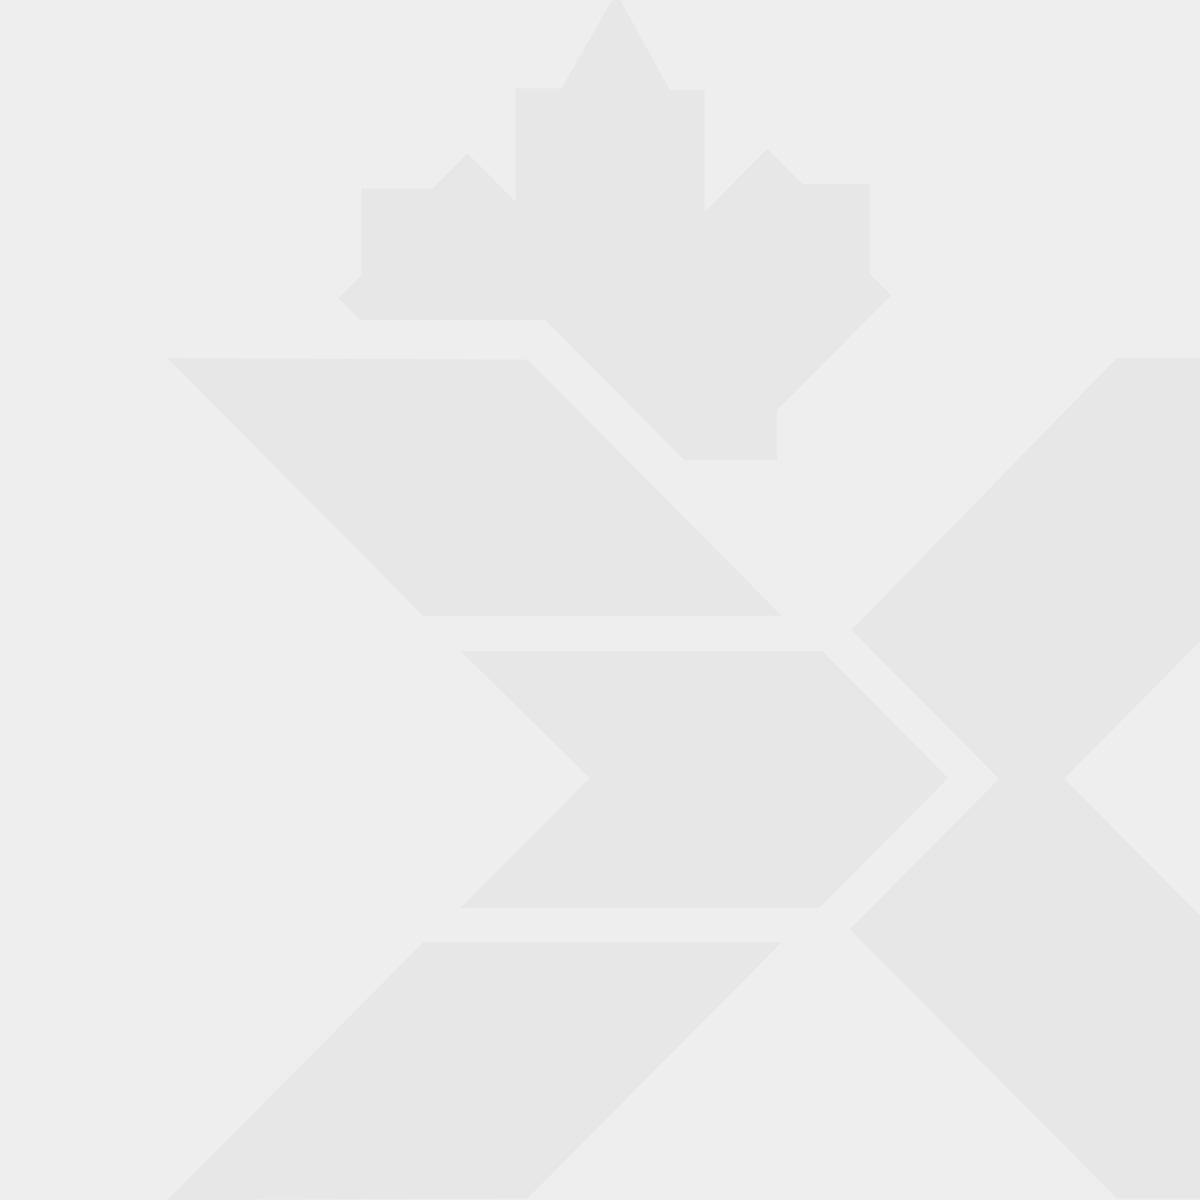 Dyson V8 Animal ™ Cordless Vacuum Cleaner (164529-01)